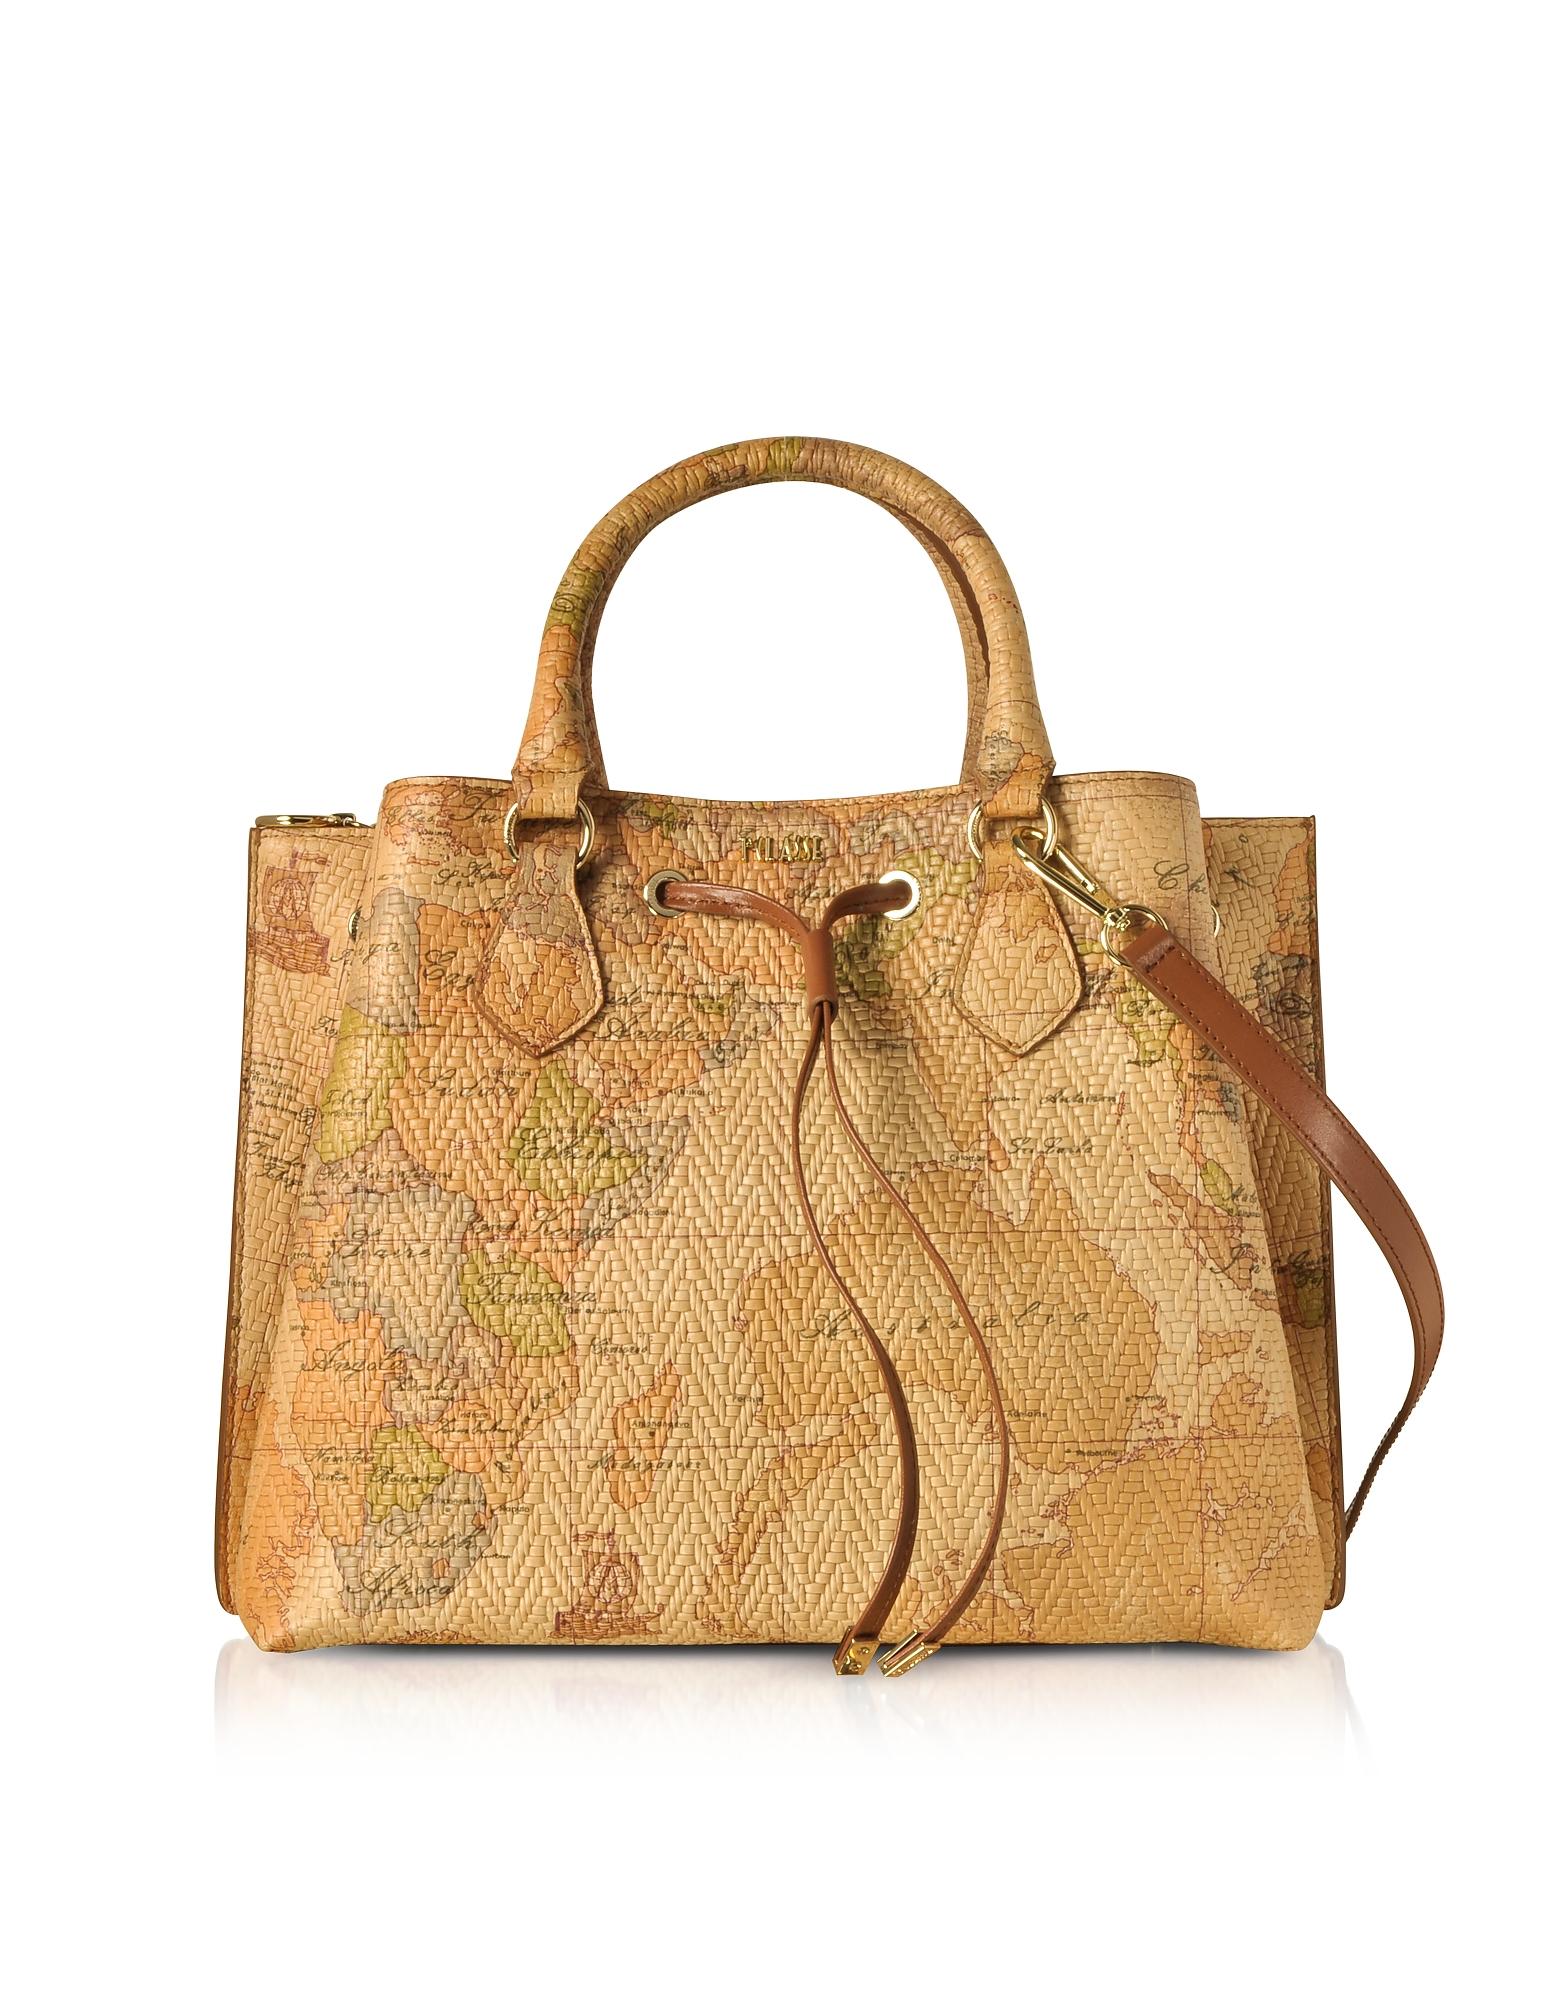 ALVIERO MARTINI 1A CLASSE Geo Print Woven Leather Frida Bag in Gold